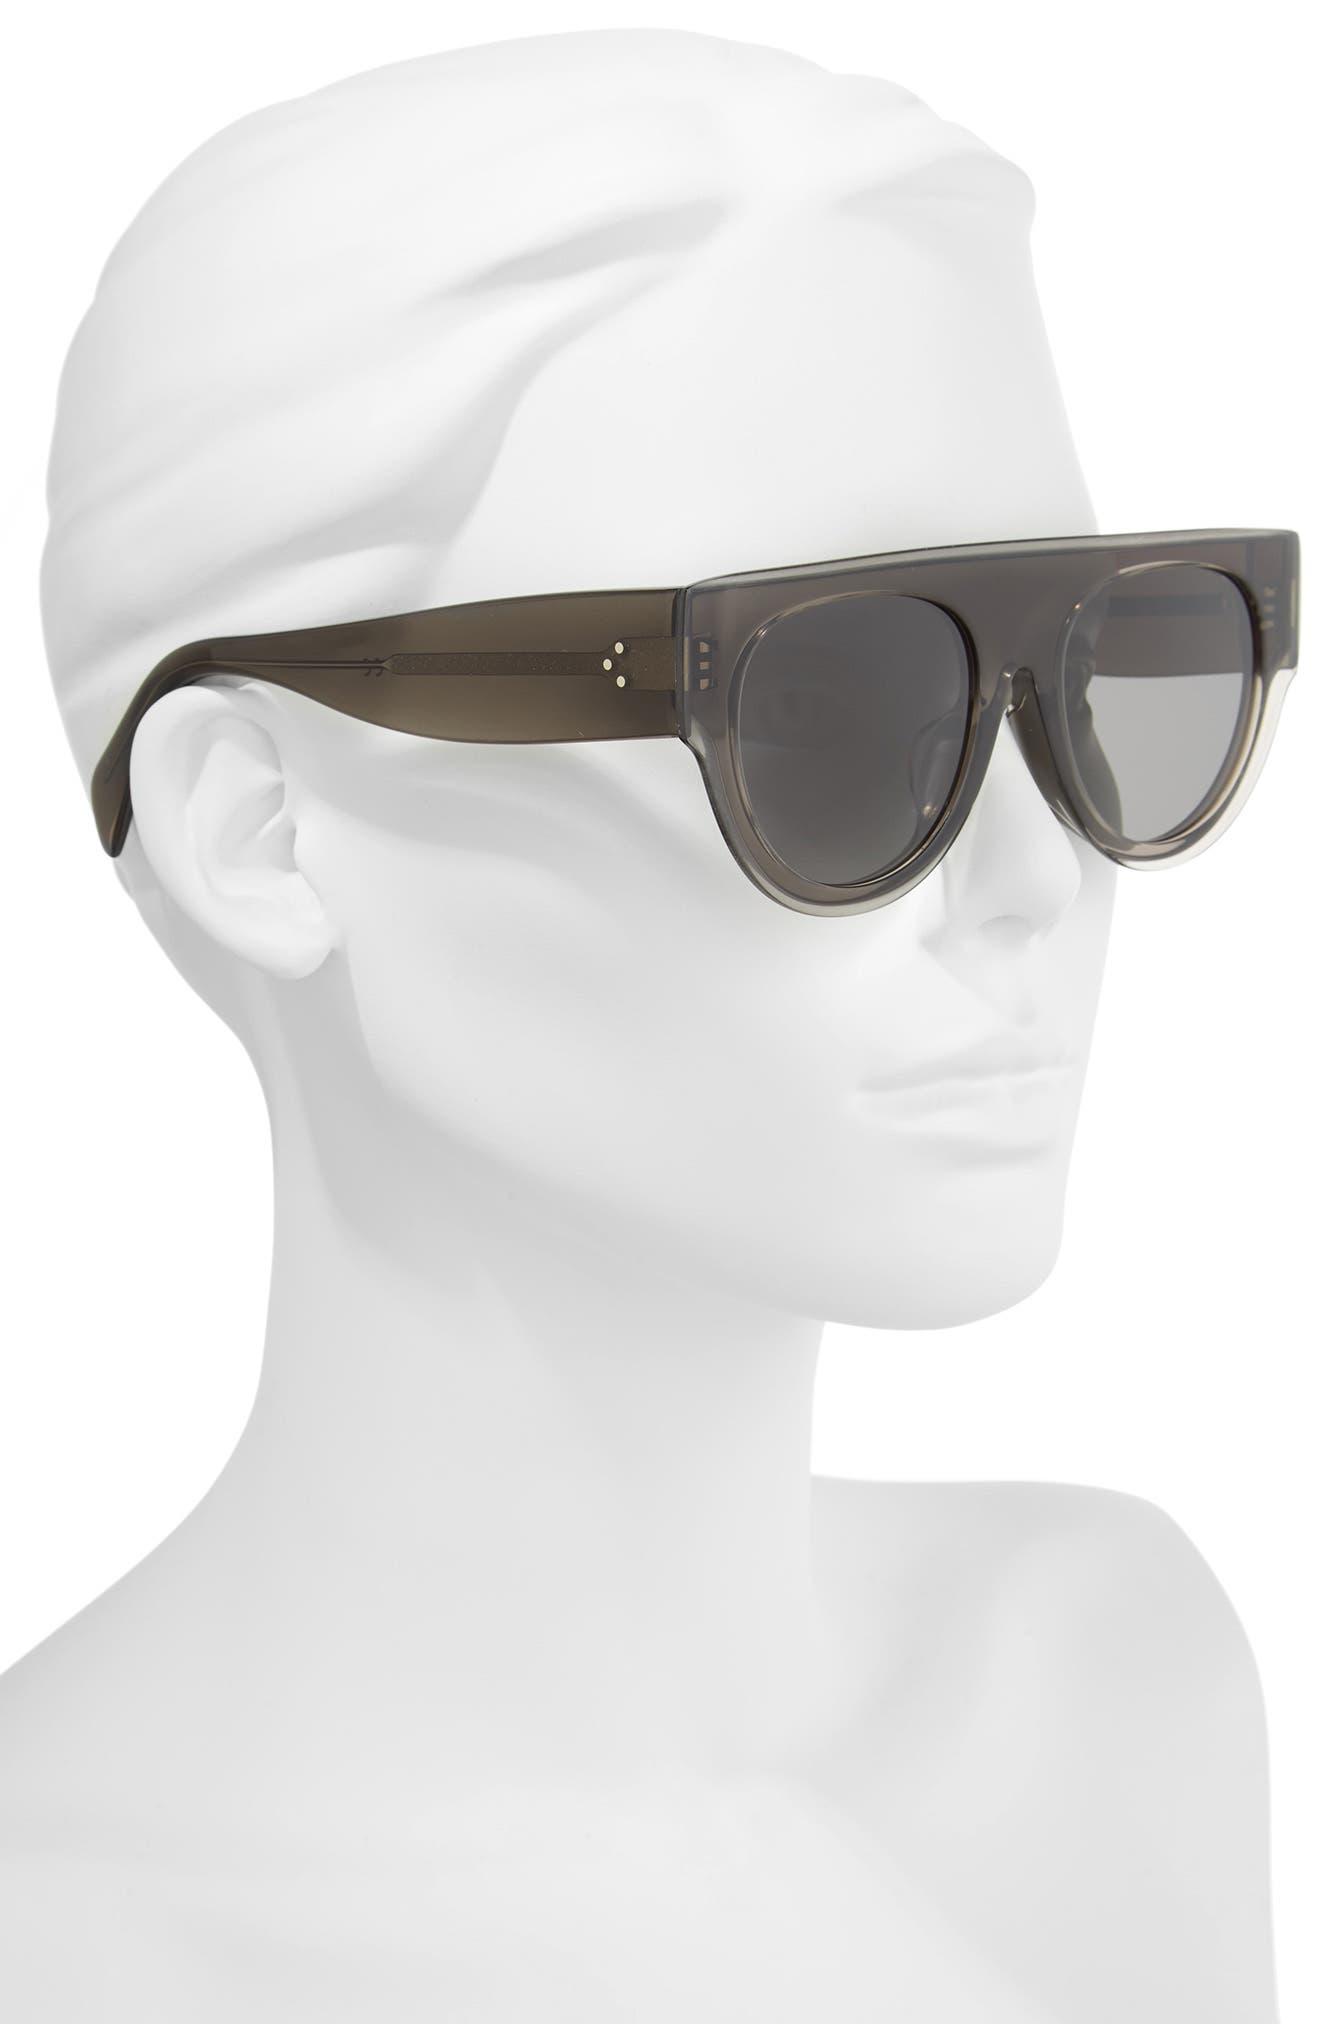 52mm Pilot Sunglasses,                             Alternate thumbnail 2, color,                             026